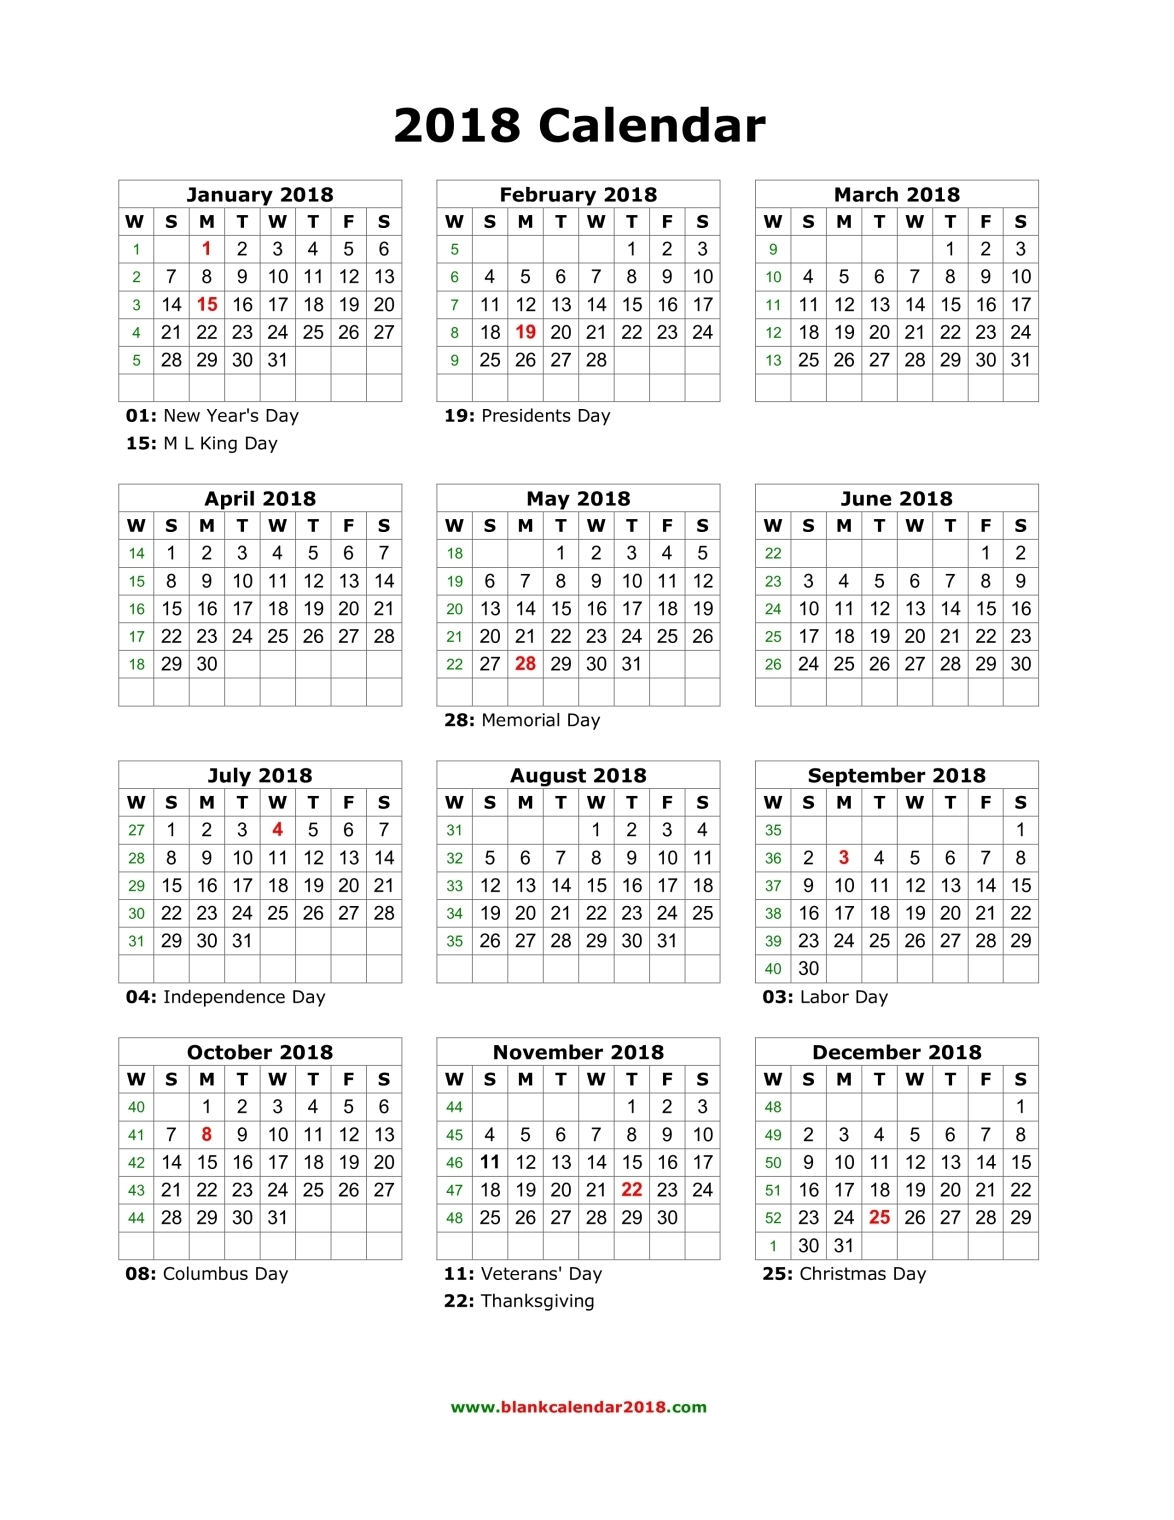 Blank 2018 Calendar | 2018 calendar printable